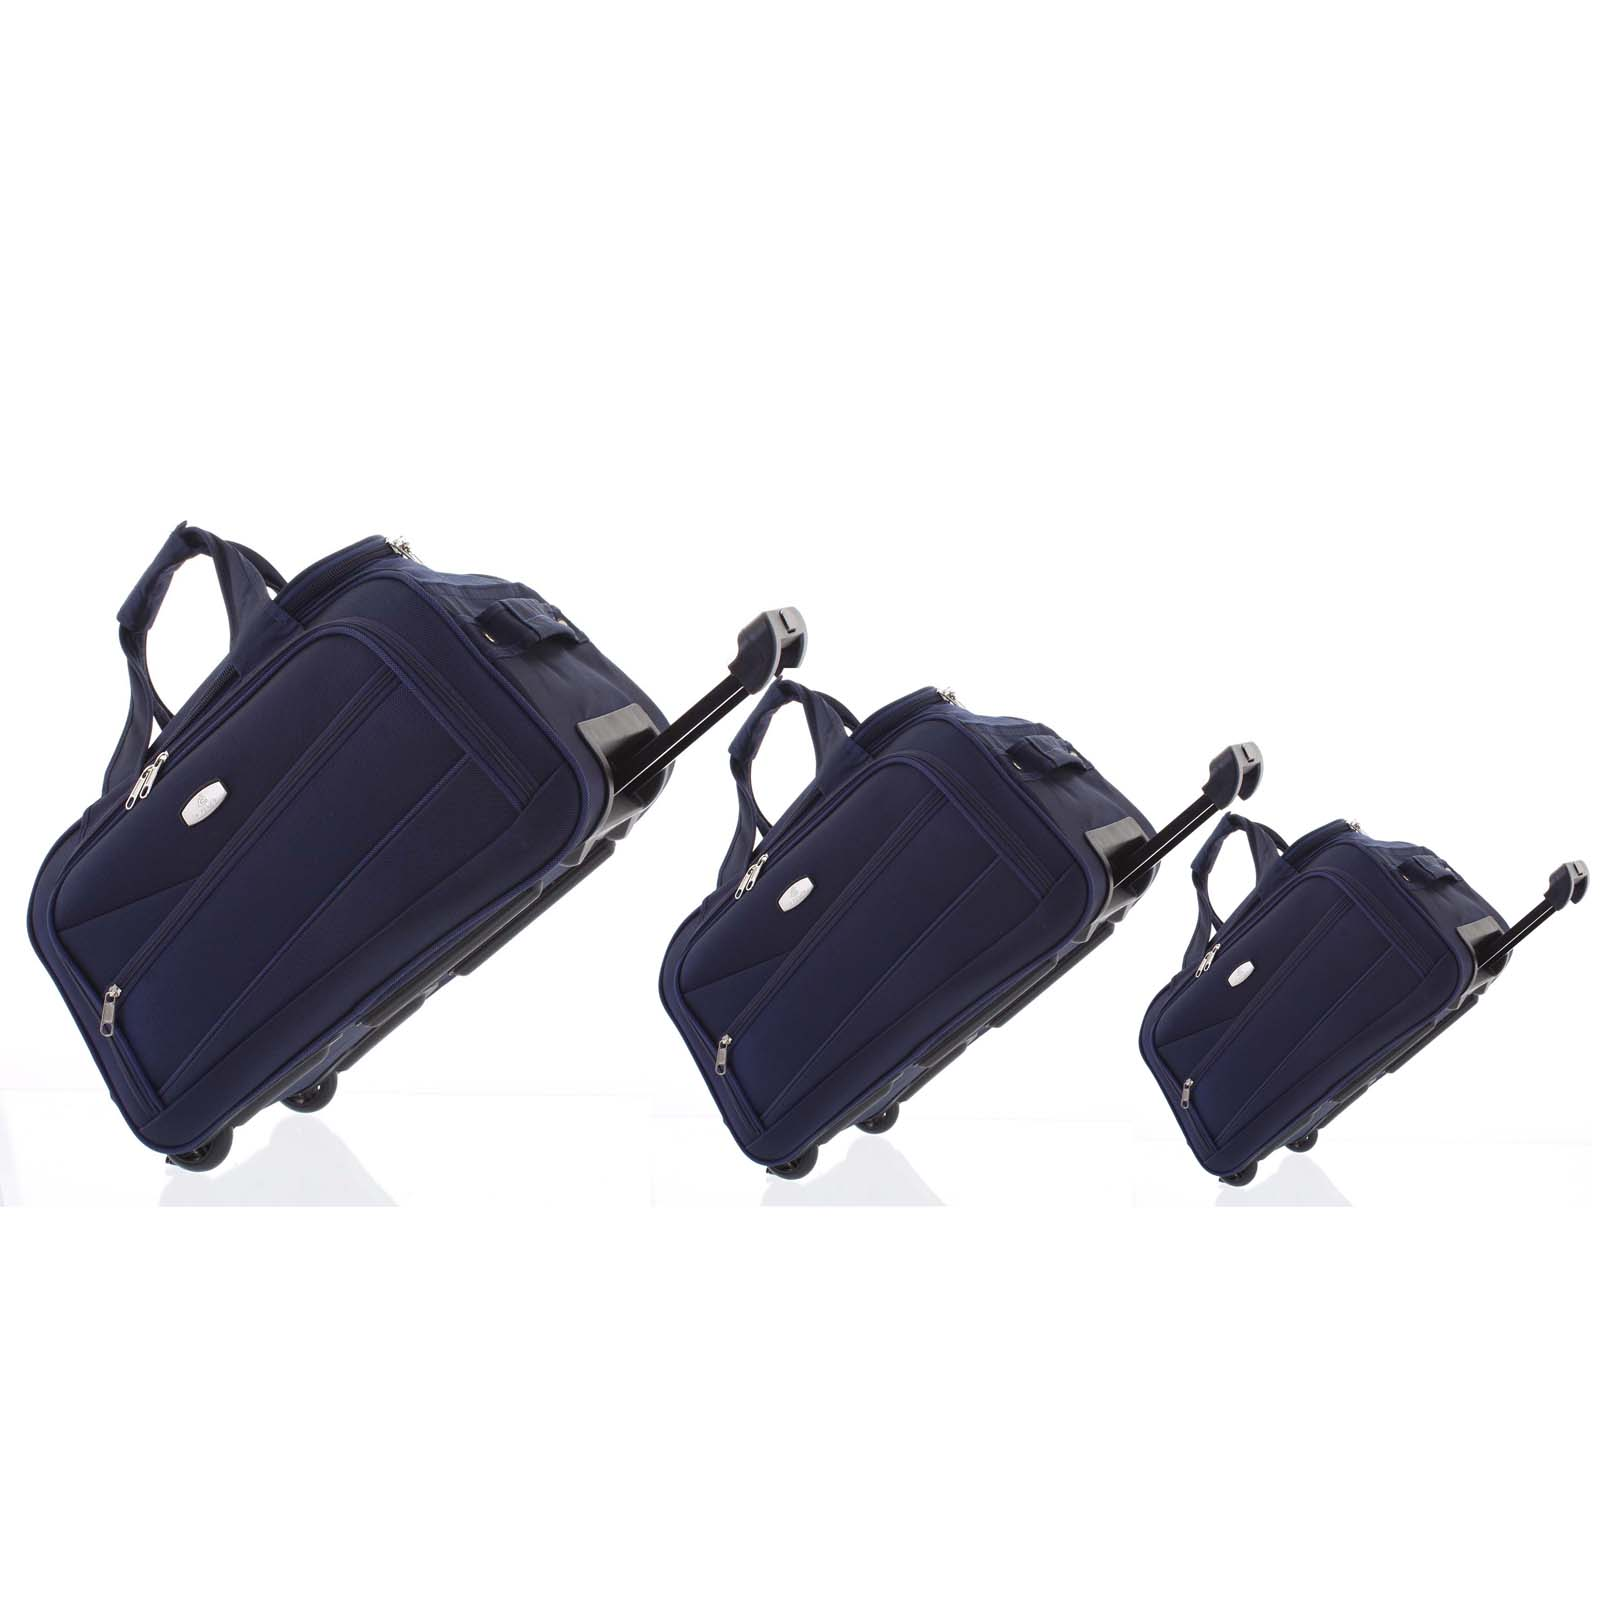 Tmavomodrá cestovná taška na kolieskach sada - Lumi Sakk L, M, S modrá